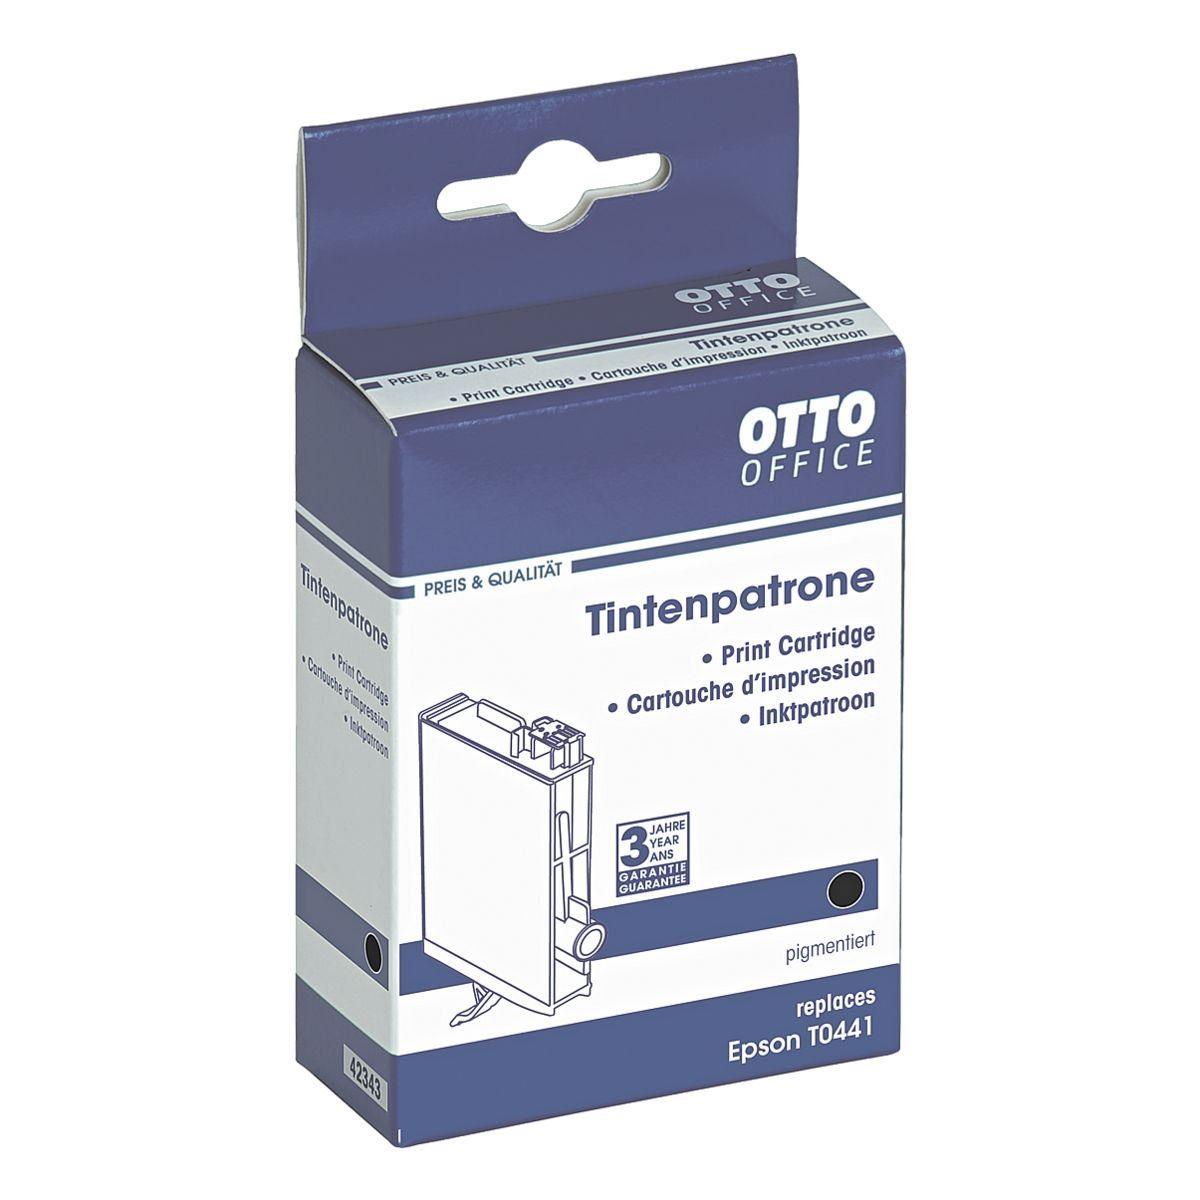 OTTO Office Tintenpatrone ersetzt Epson »T0441«